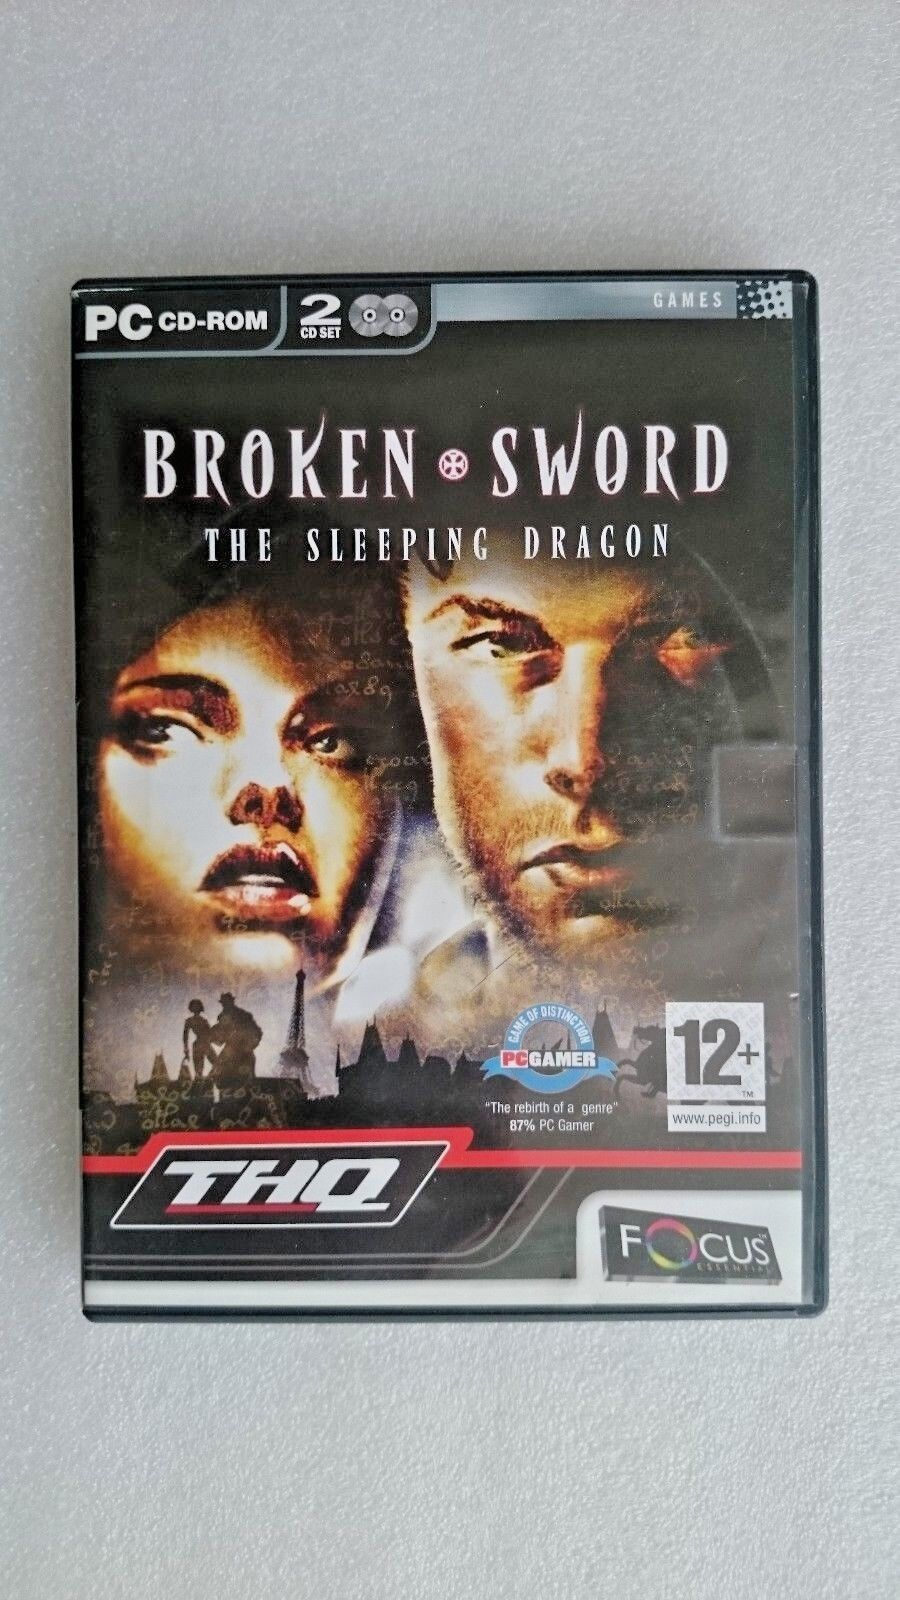 Broken Sword 3 The Sleeping Dragon